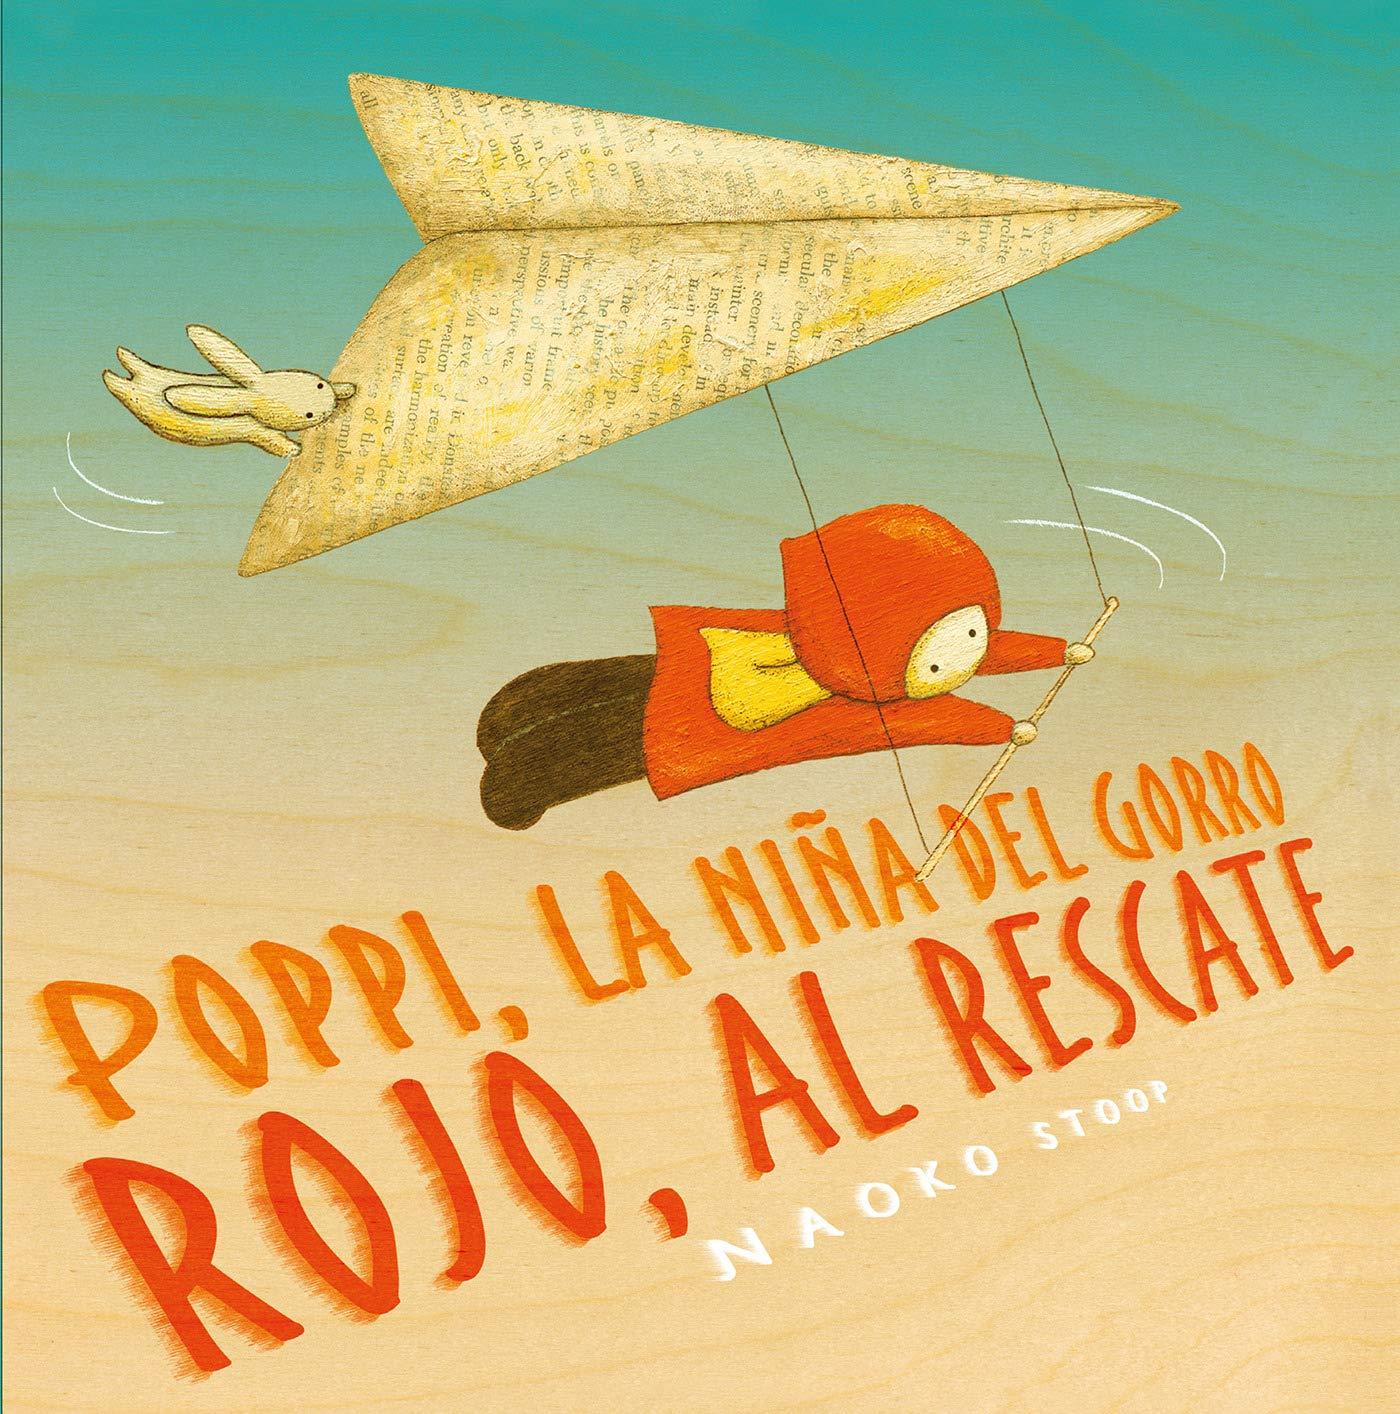 Poppi, la niña del gorro rojo al rescate / Red Knit Cap Girl To ...